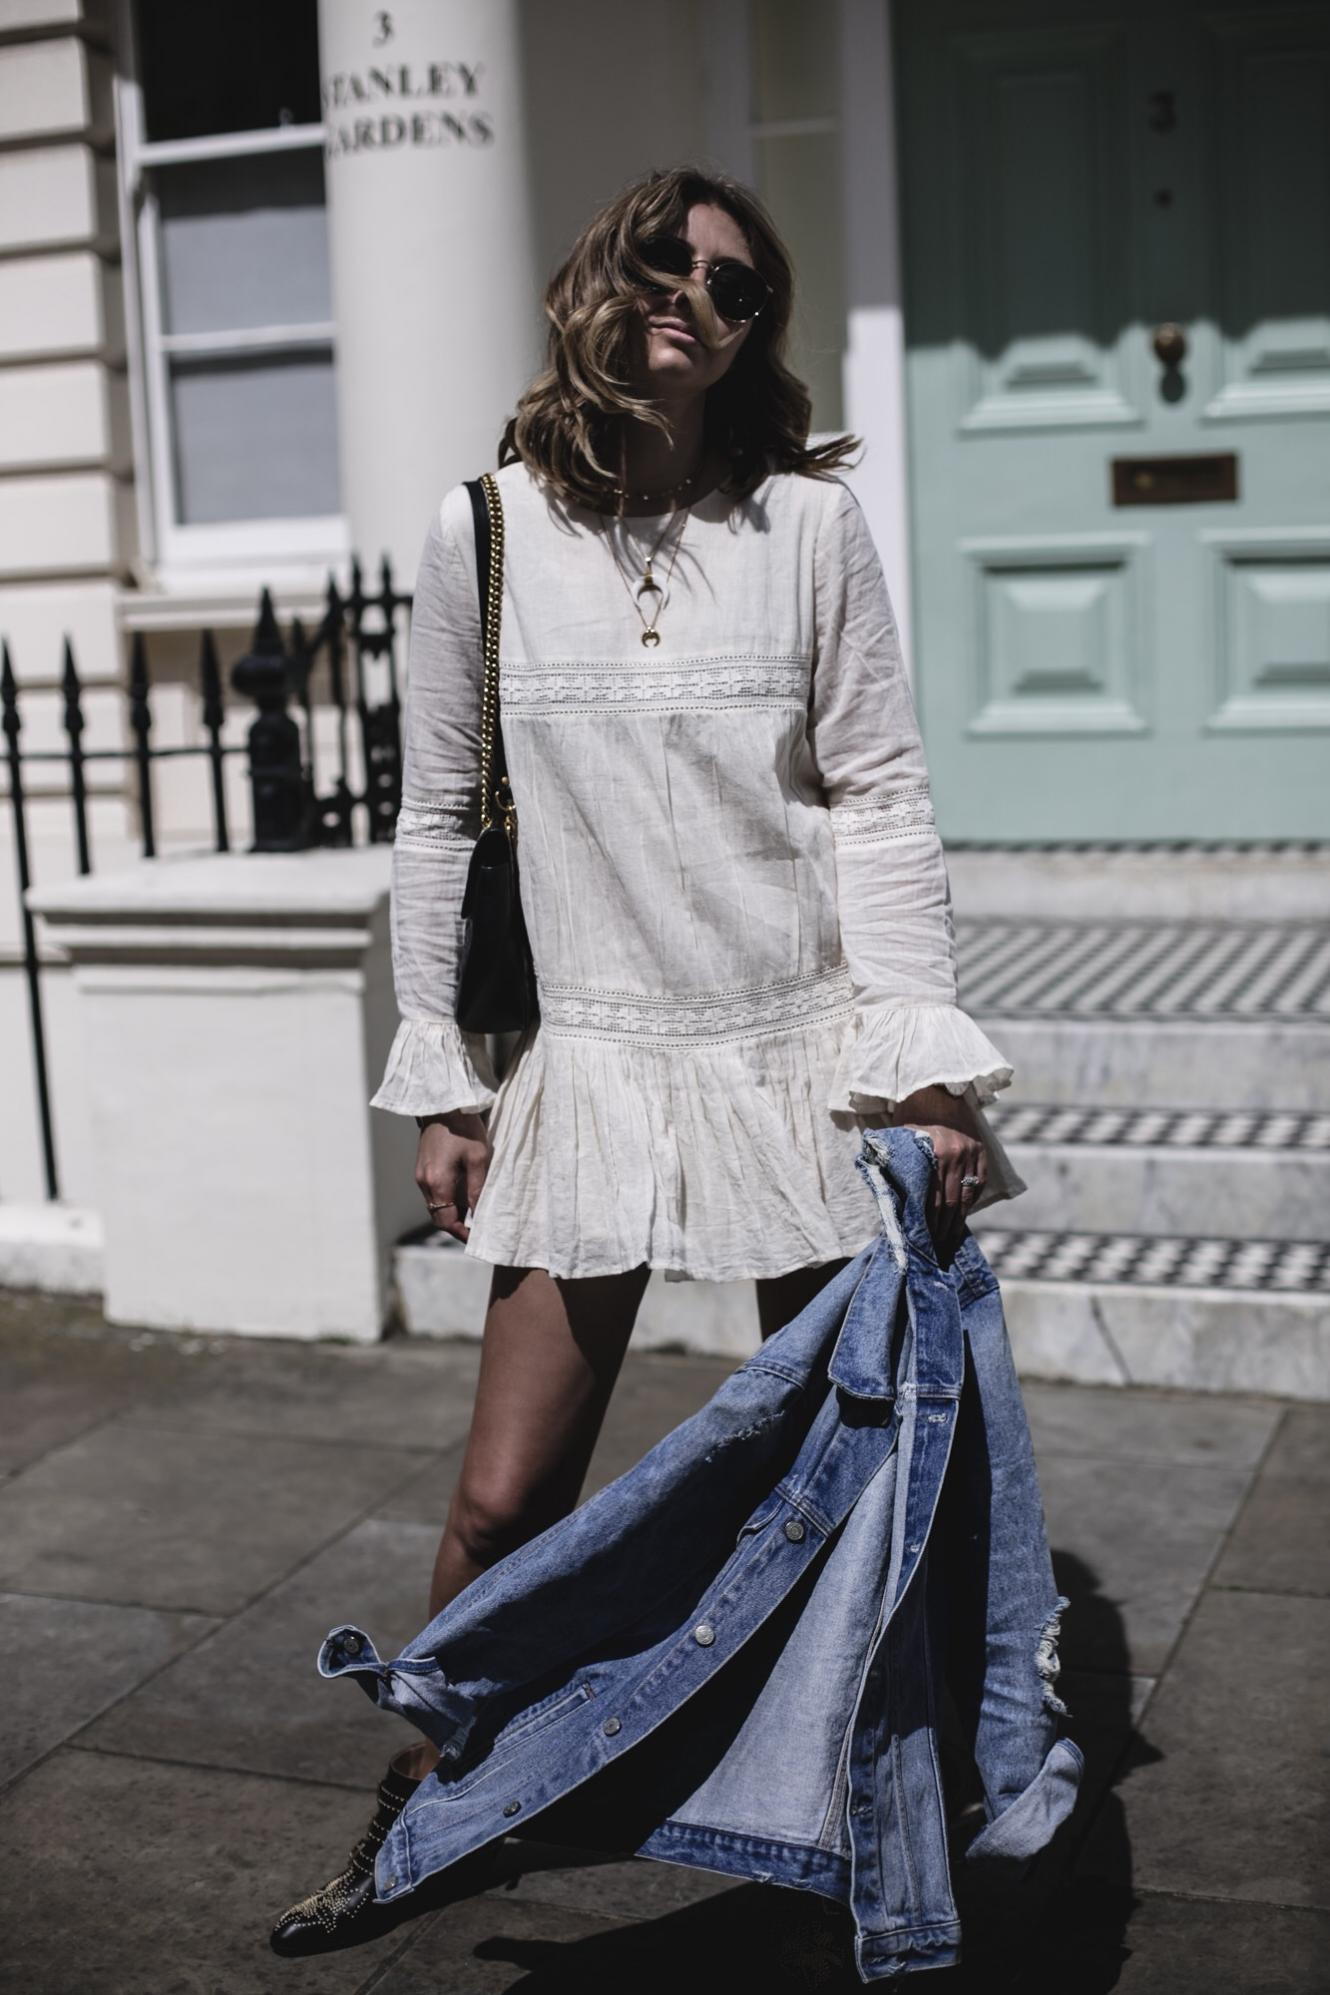 Emma Hill wearing Tularosa boho mini dress, denim jacket, gold layered necklaces, Chloe Susanna boots, Gucci Marmont bag, Summer outfit, festival style